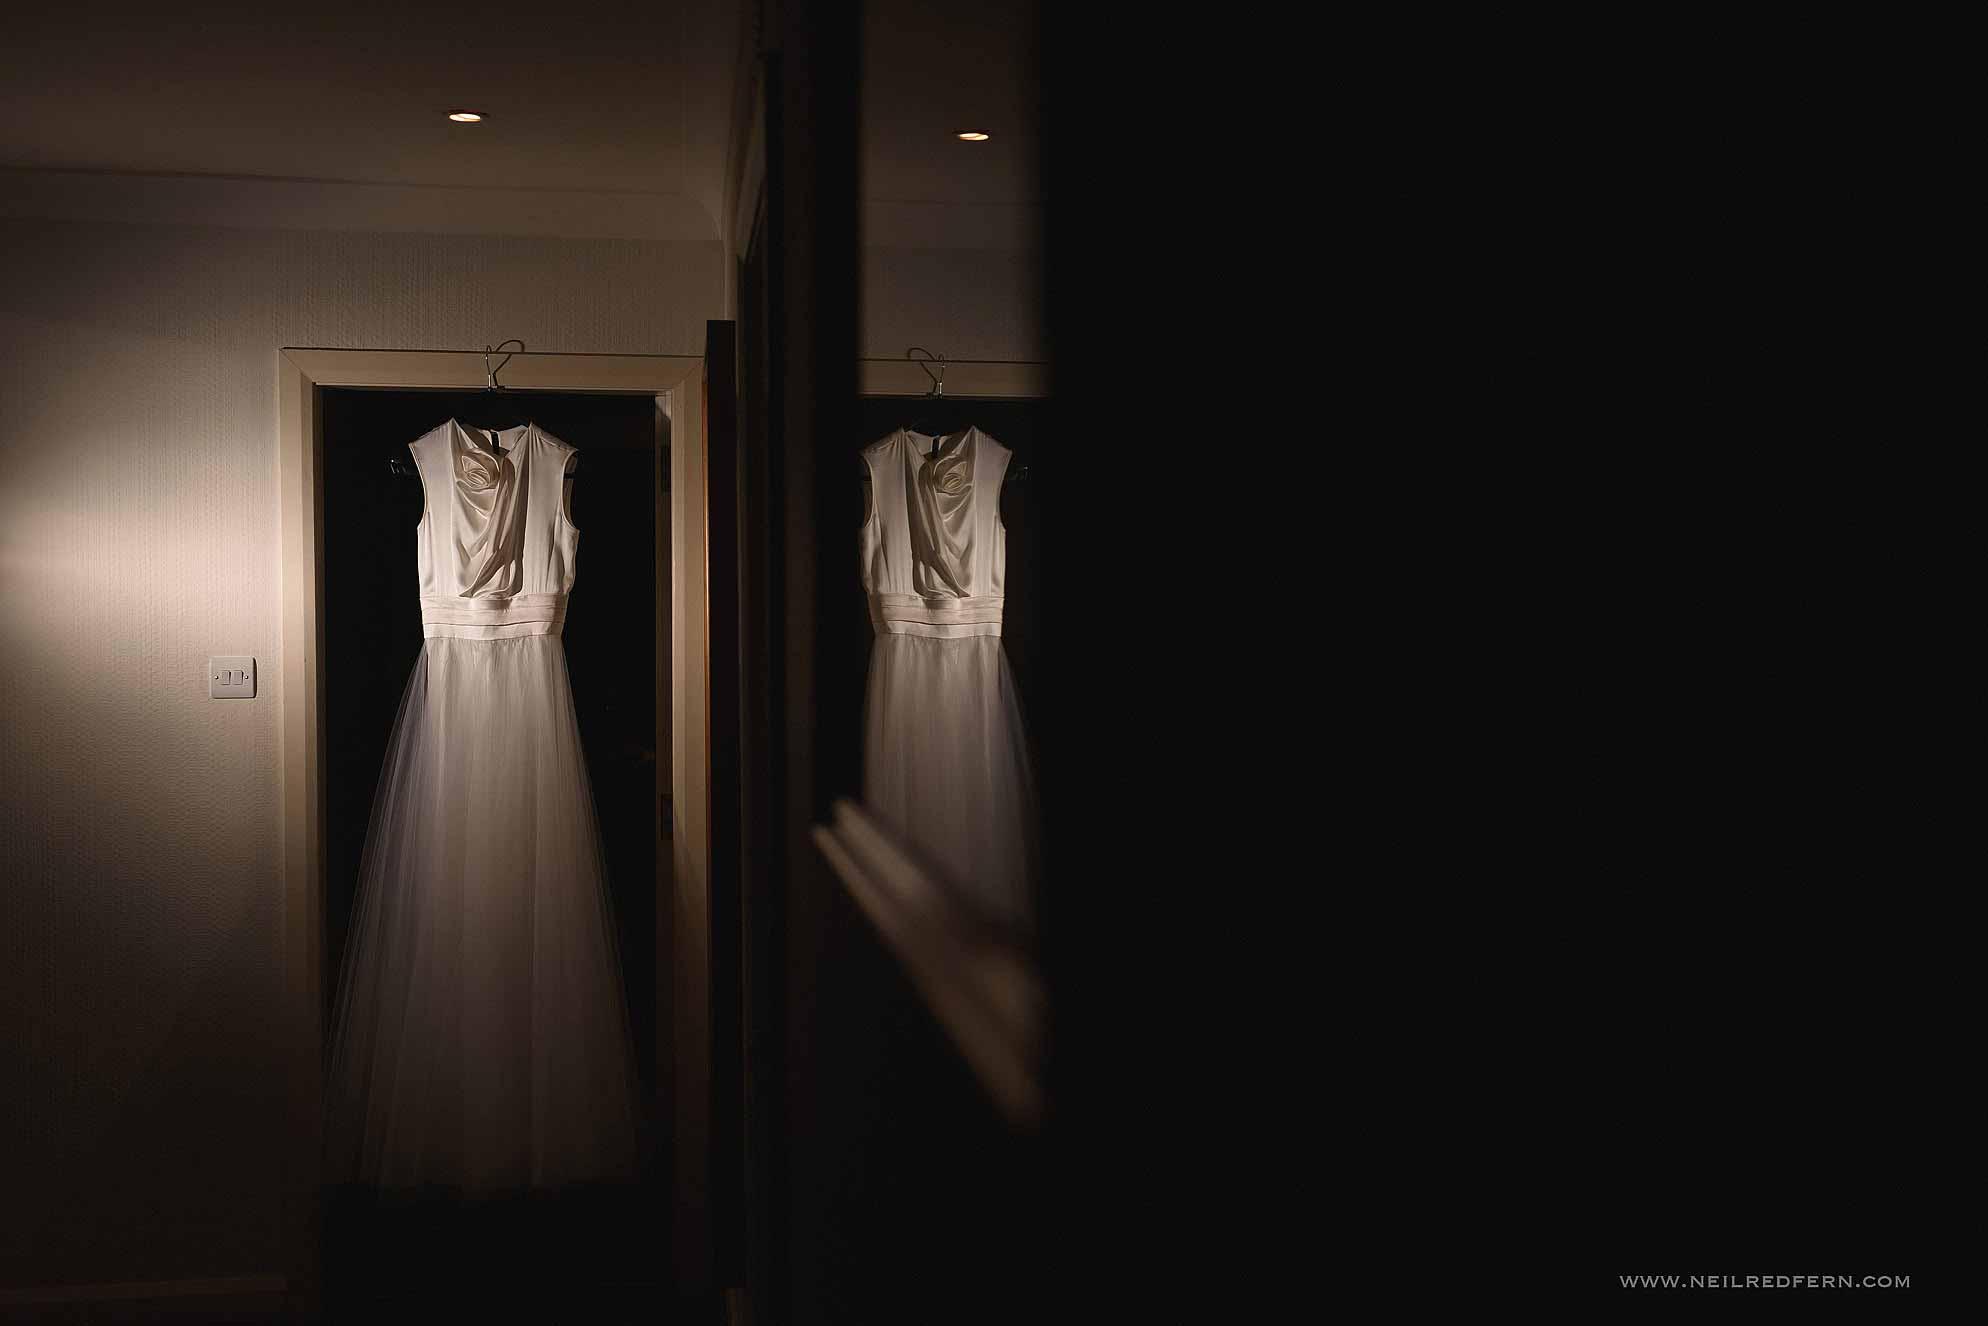 st-andrews-wedding-photograph-02